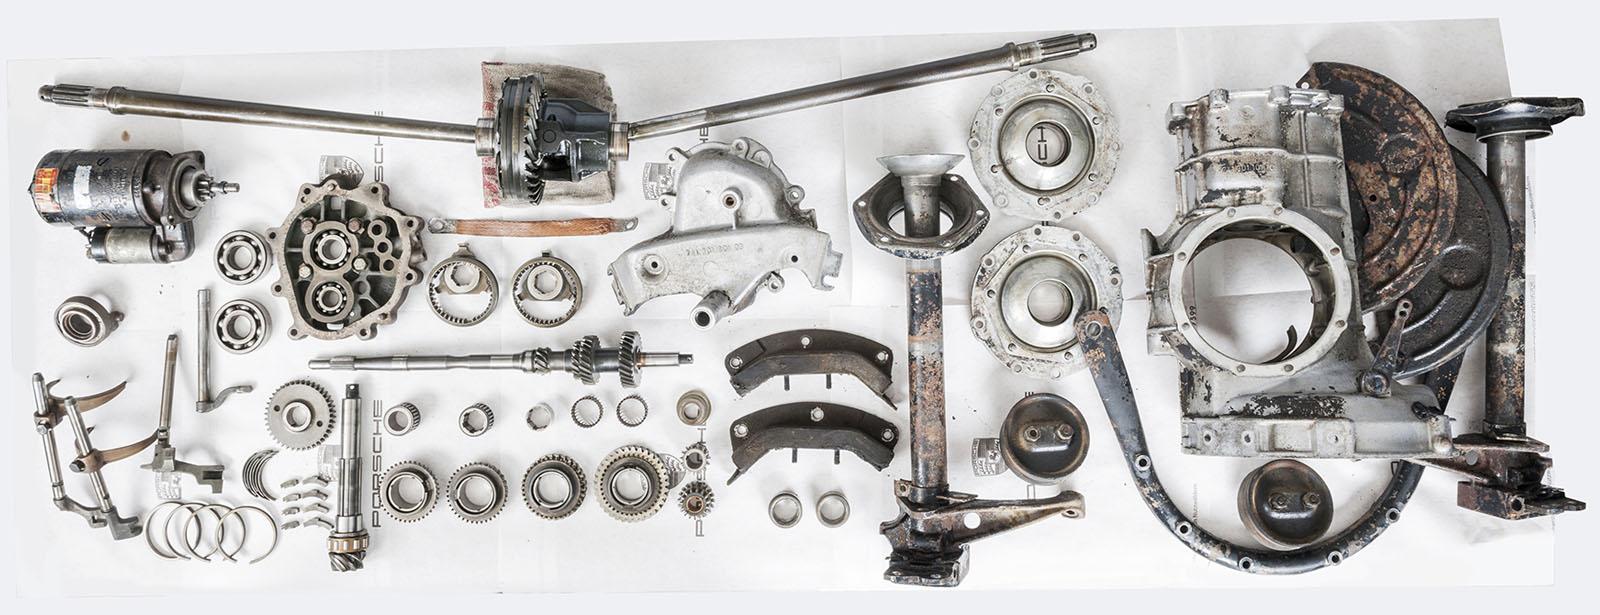 Porsche - Transmission - Disassembly